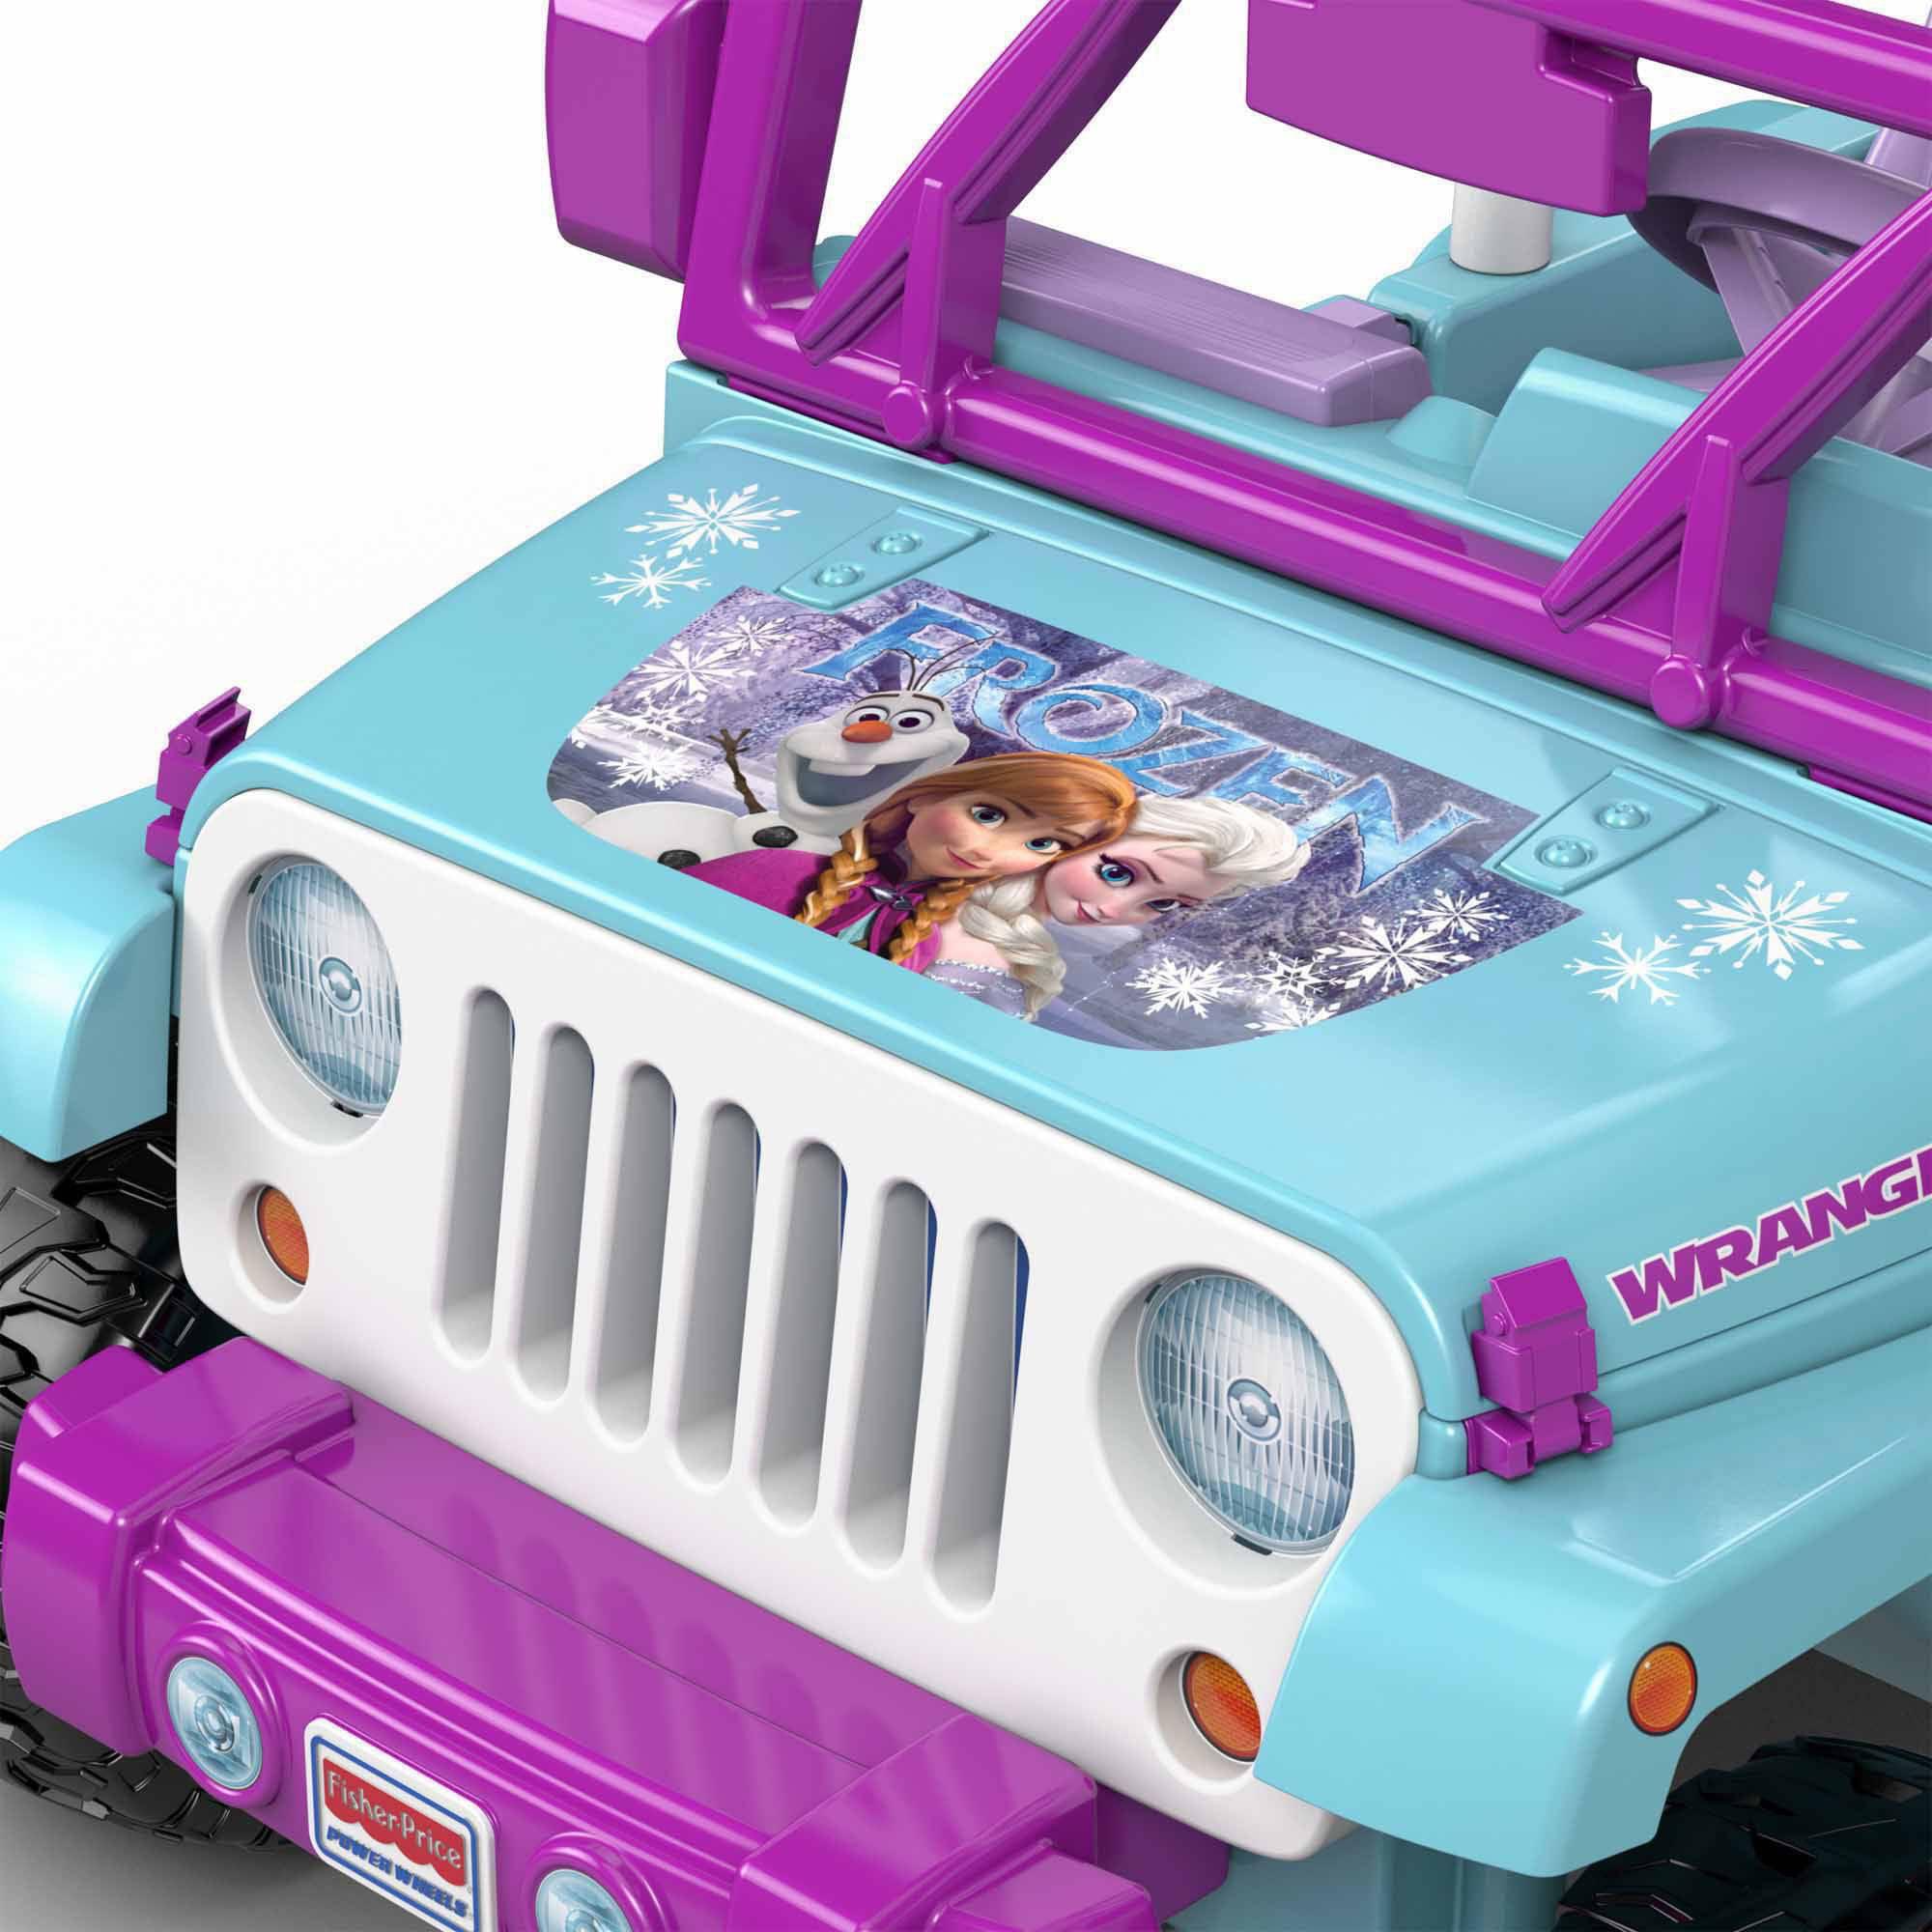 Power Wheels Disney Frozen Jeep Wrangler 12-Volt Battery-Powered ...